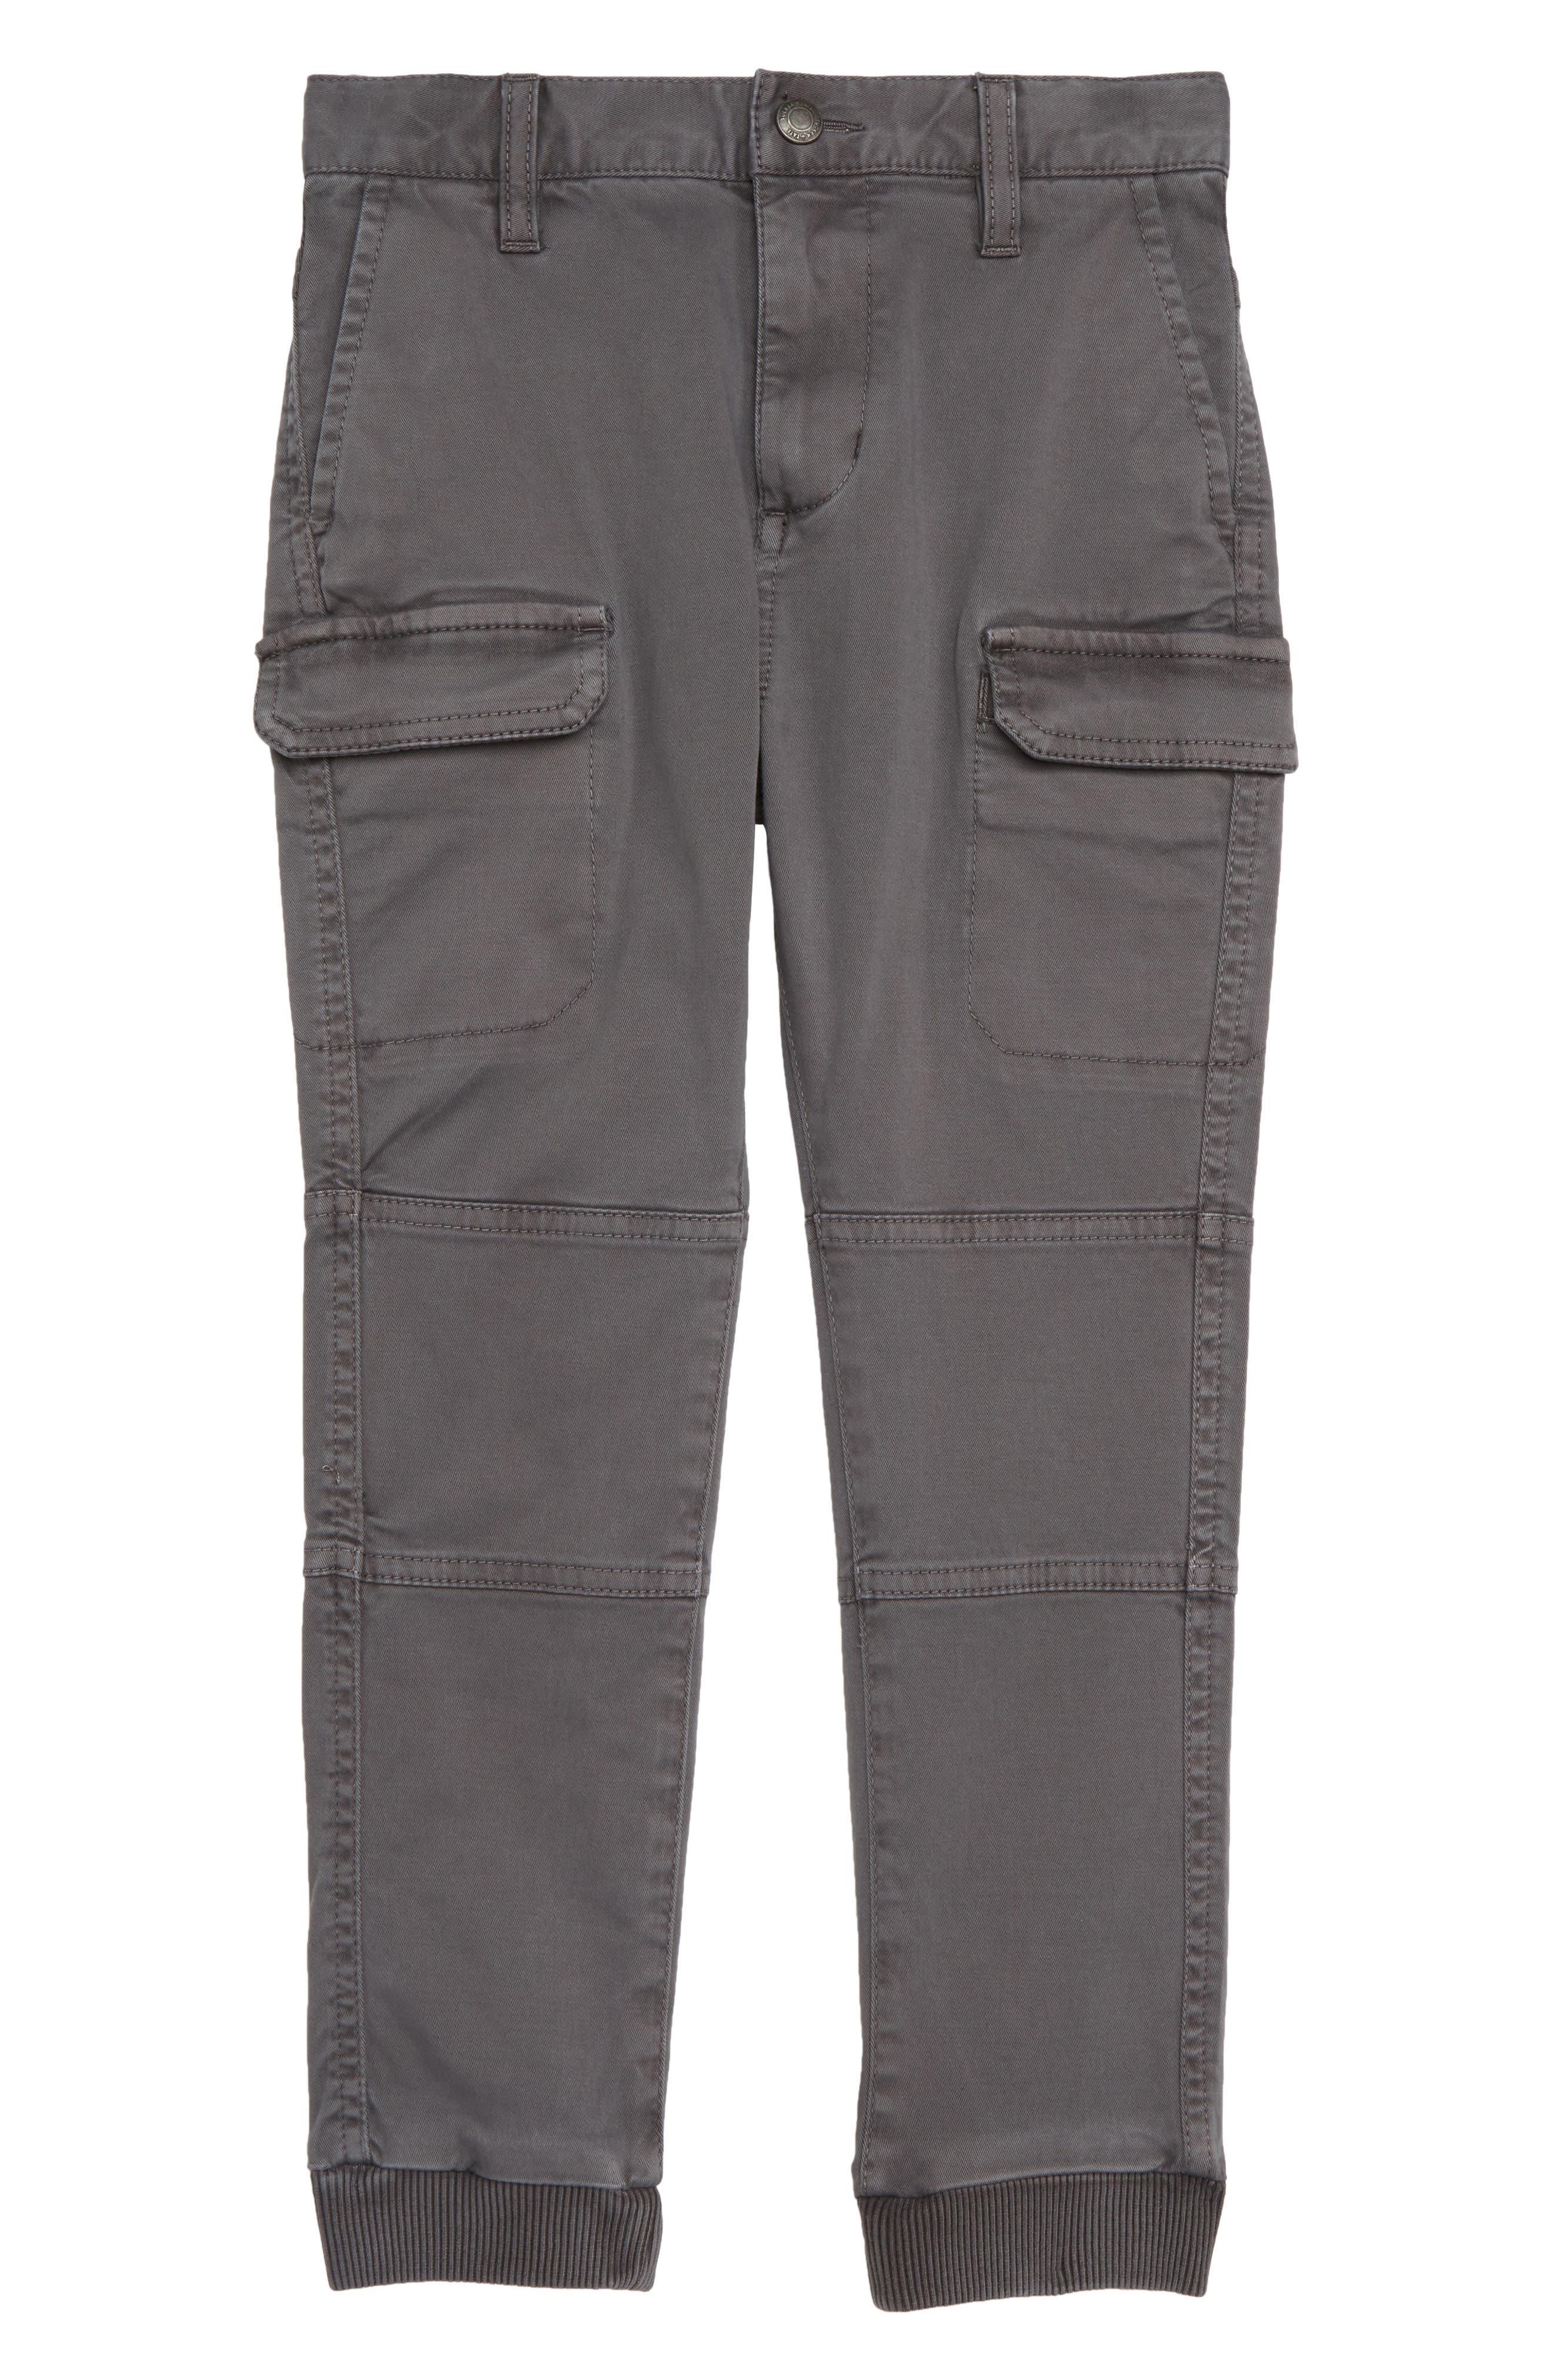 Cargo Jogger Pants,                             Main thumbnail 1, color,                             GREY CASTLEROCK